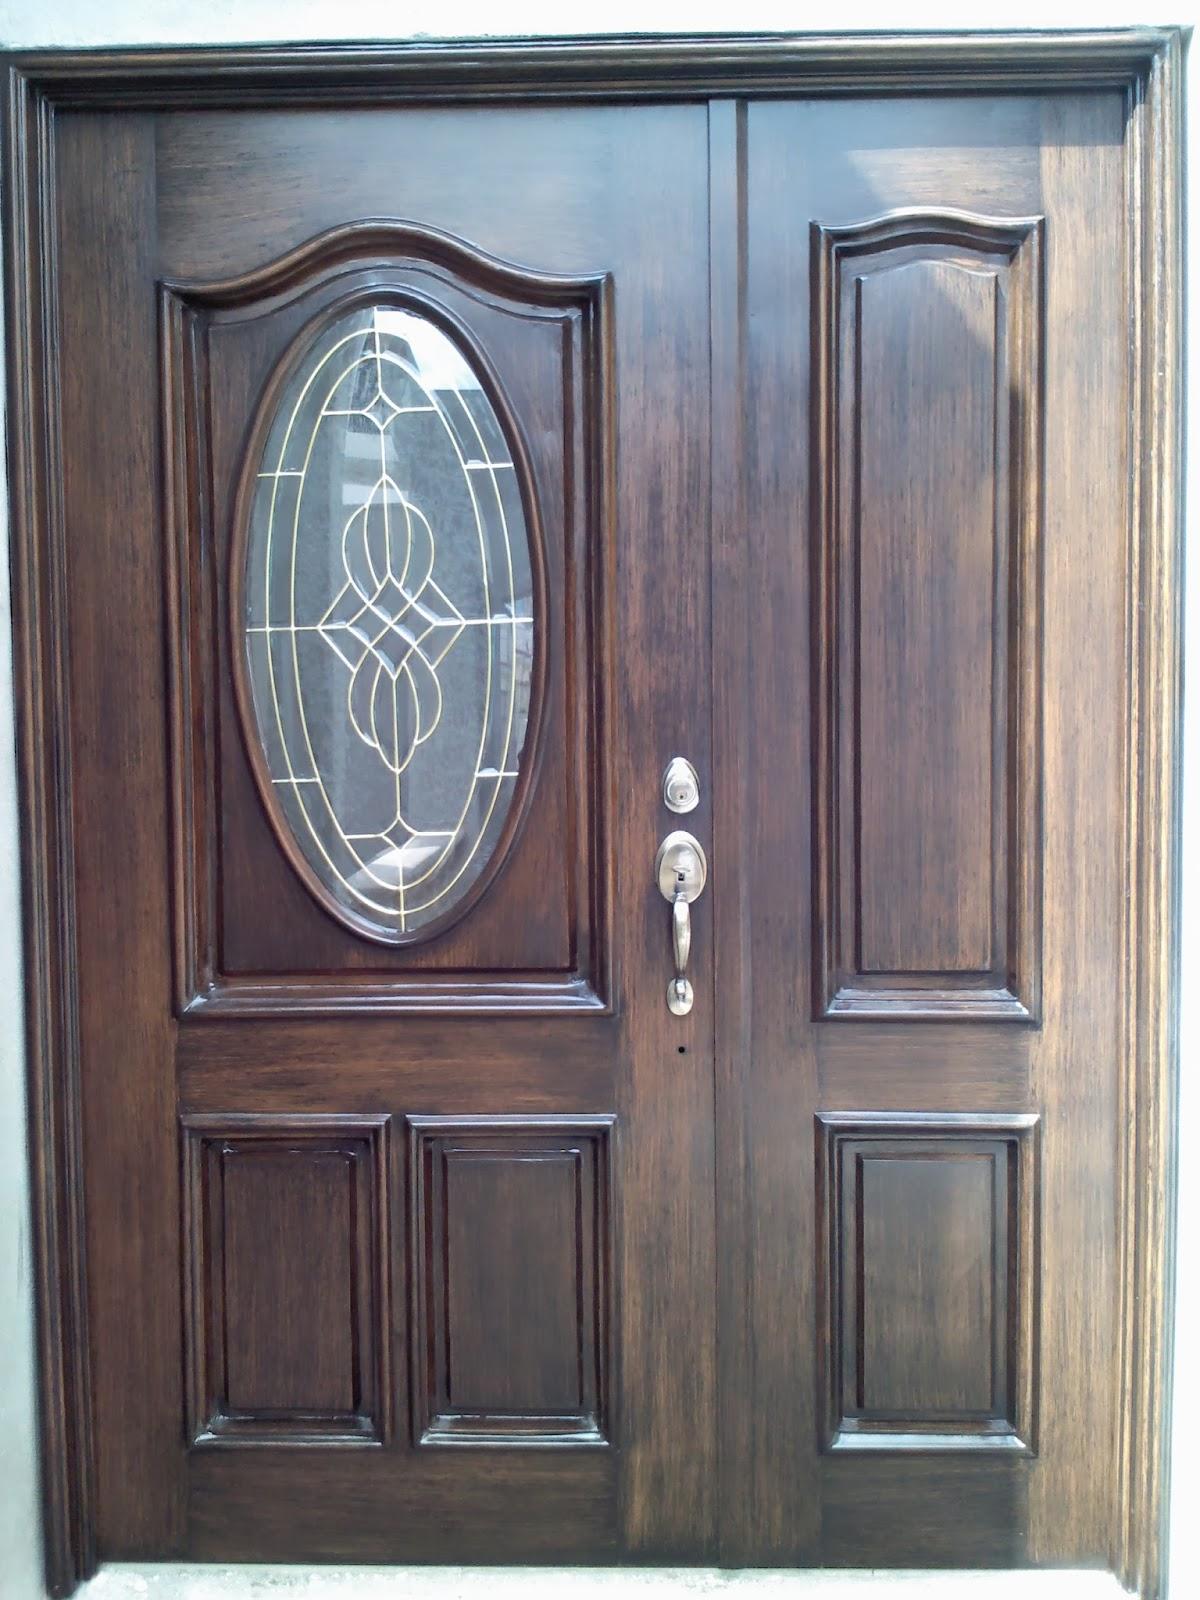 San jose herreria residencial for Puertas de madera con herreria